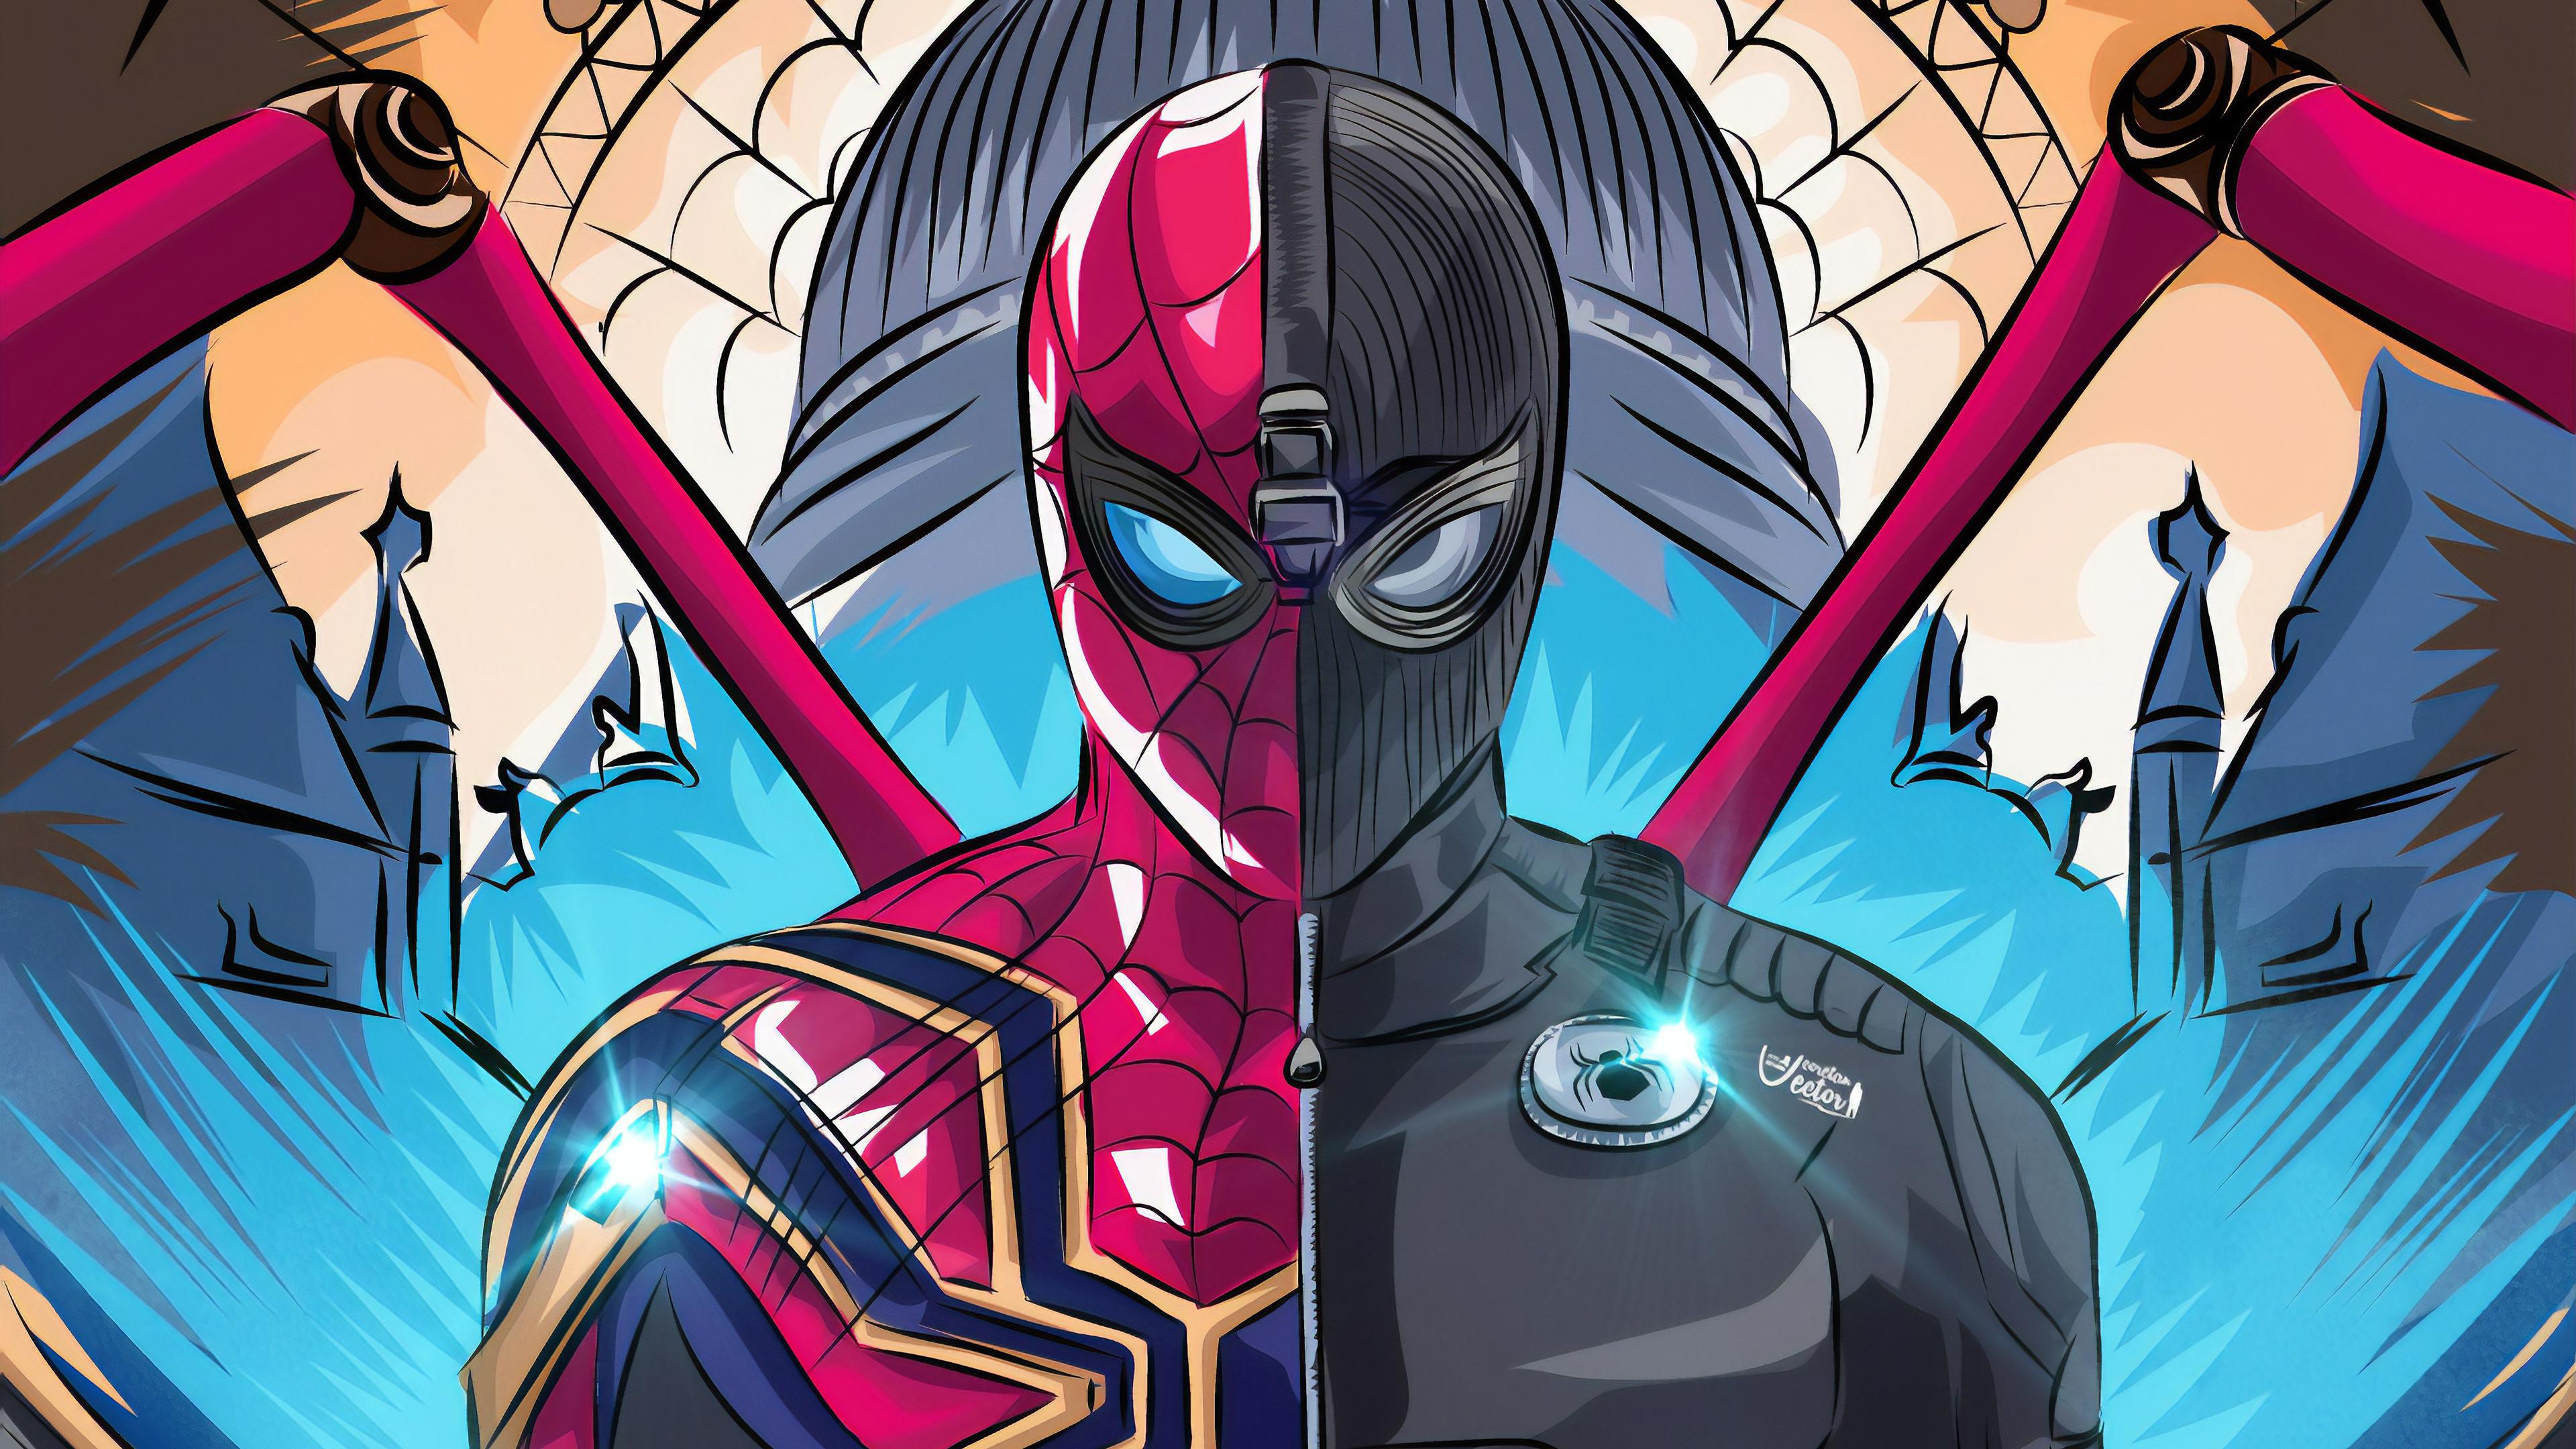 4k spiderman farfrom home 1562105484 - 4k Spiderman Farfrom Home - superheroes wallpapers, spiderman wallpapers, spiderman far from home wallpapers, hd-wallpapers, digital art wallpapers, behance wallpapers, artwork wallpapers, 4k-wallpapers